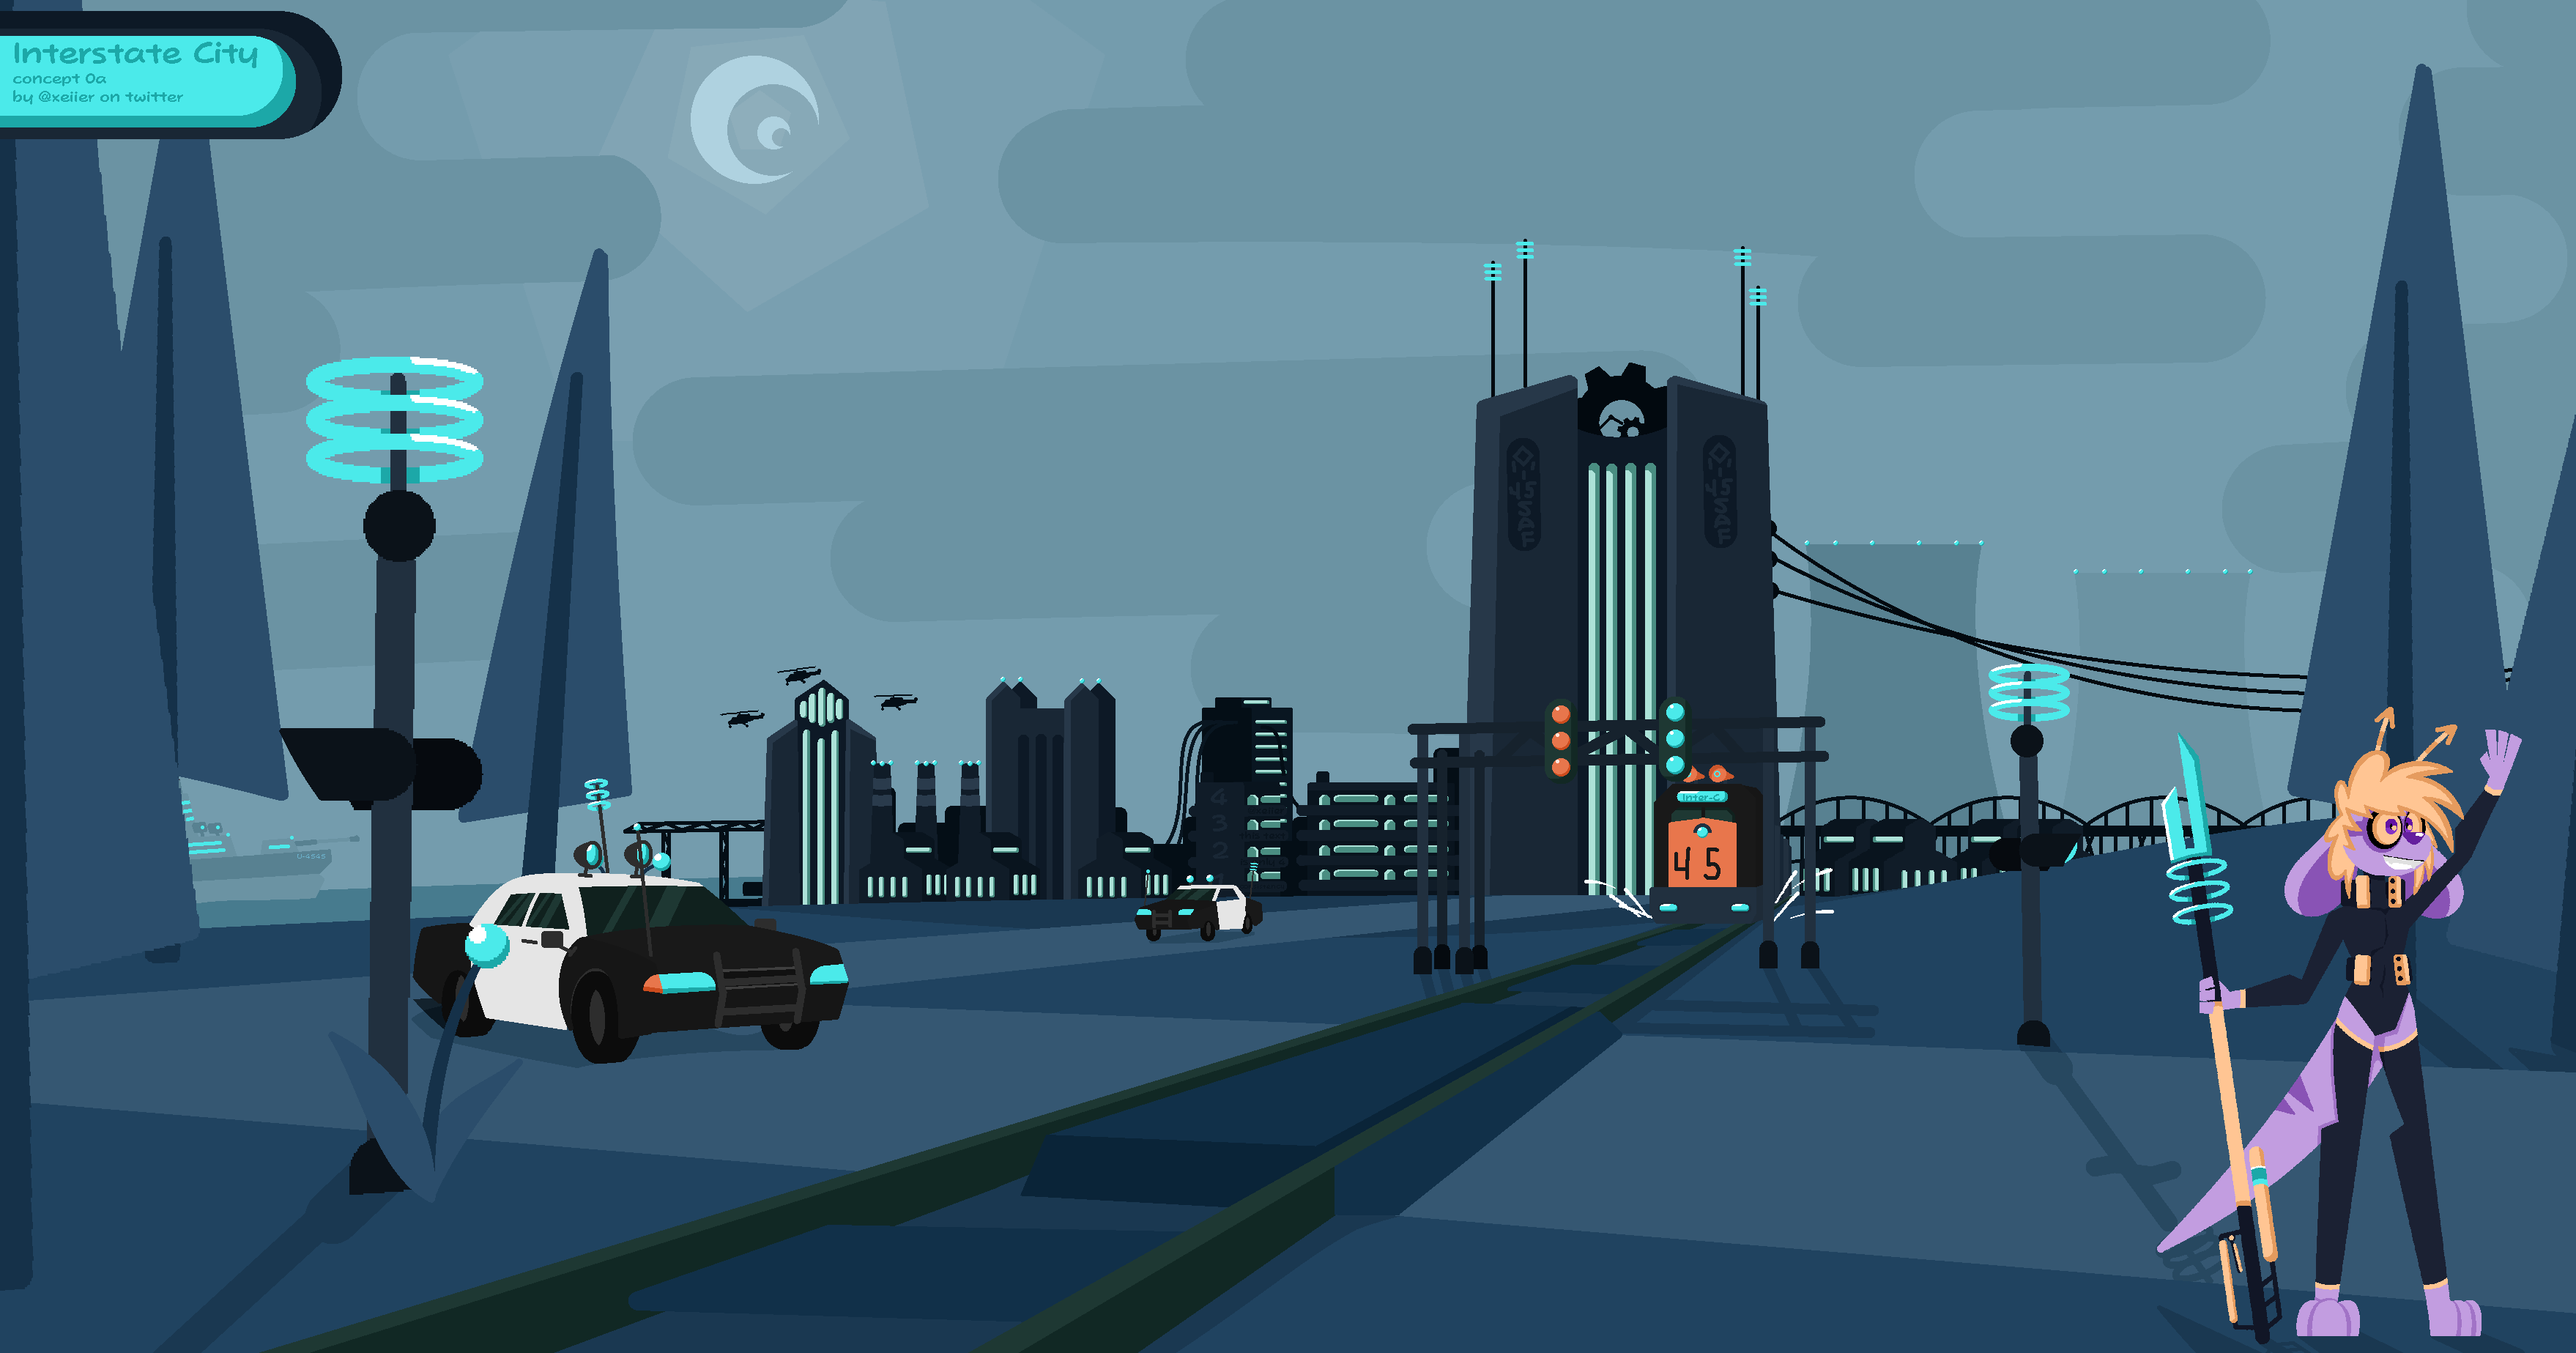 Interstate City - OTS Concept art